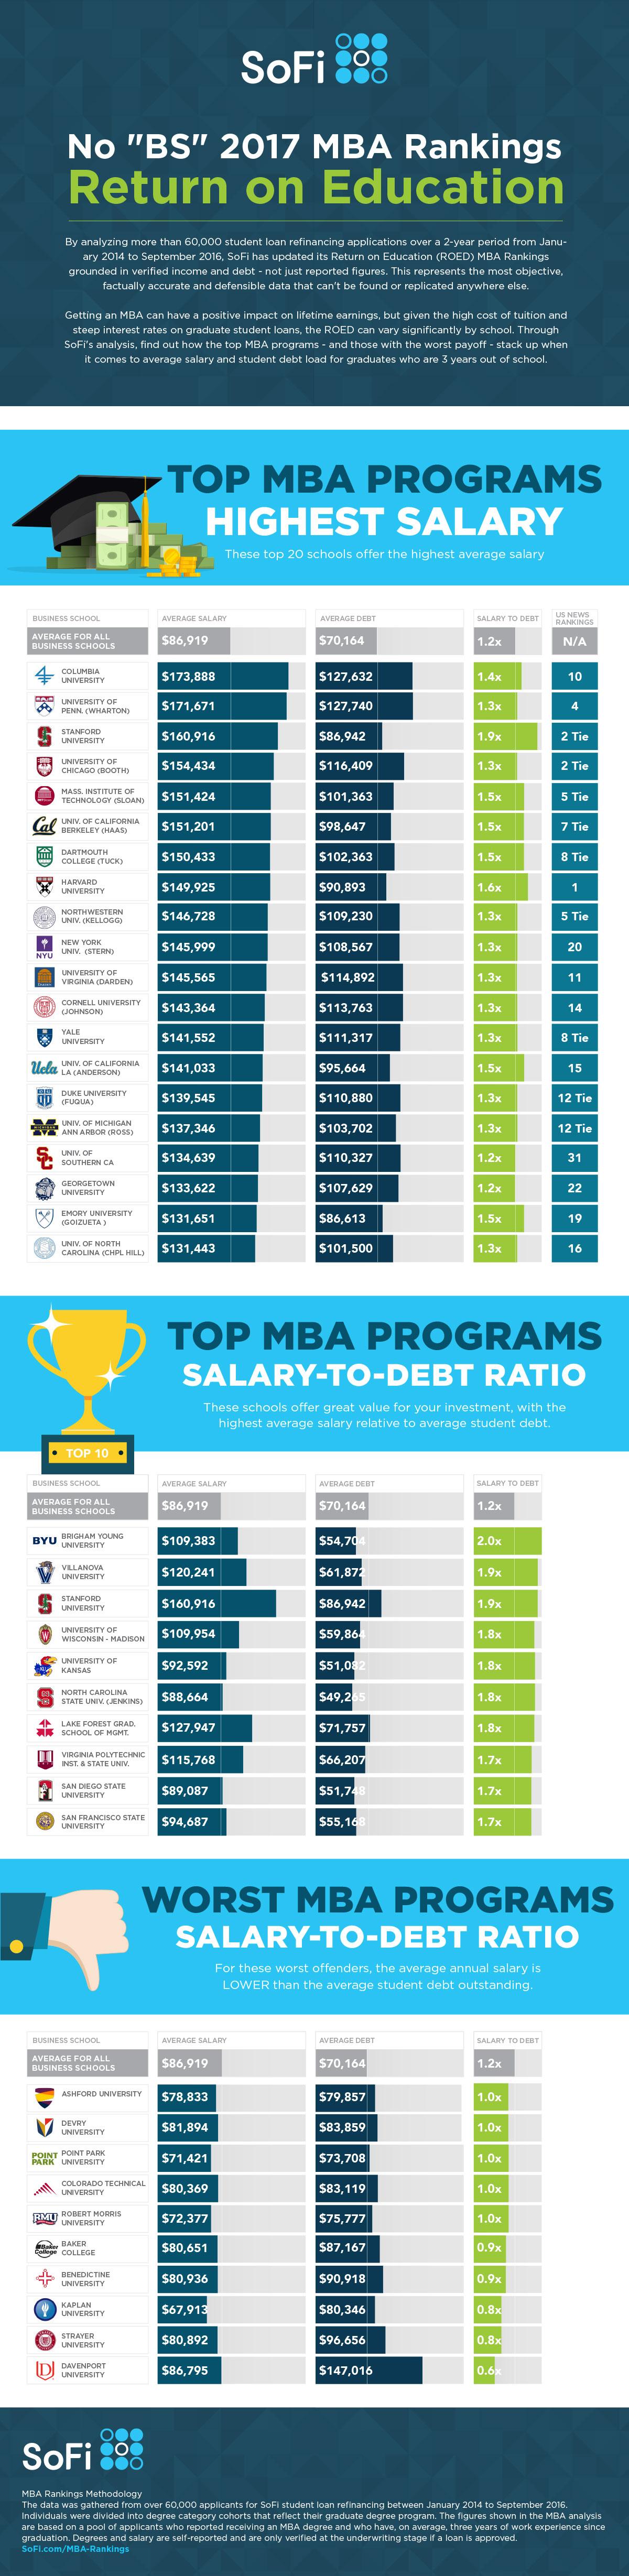 SoFi ROEd Inforgraphic - MBA Rankings